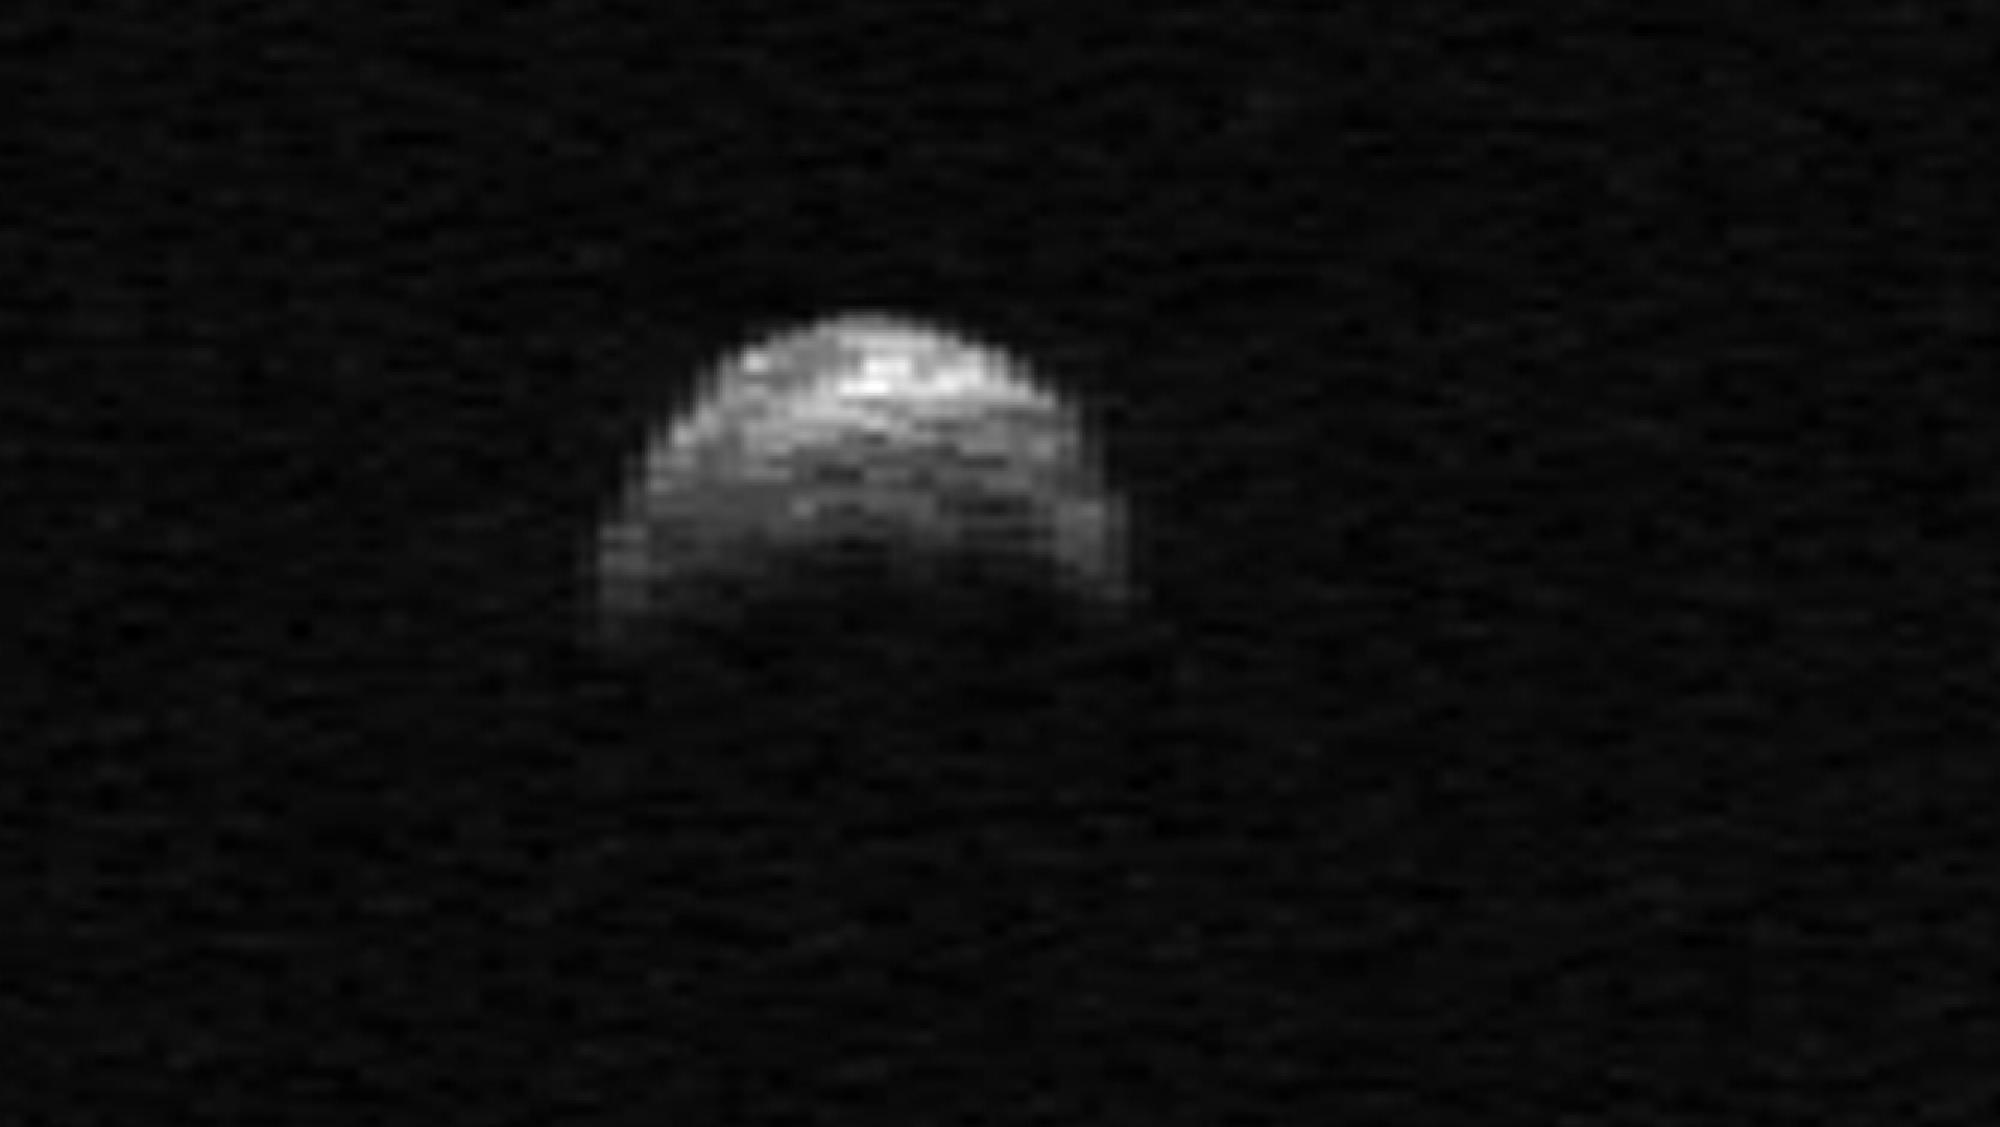 A radar image of asteroid 2005 YU55 taken by the Arecibo radio telescope in Puerto Rico.